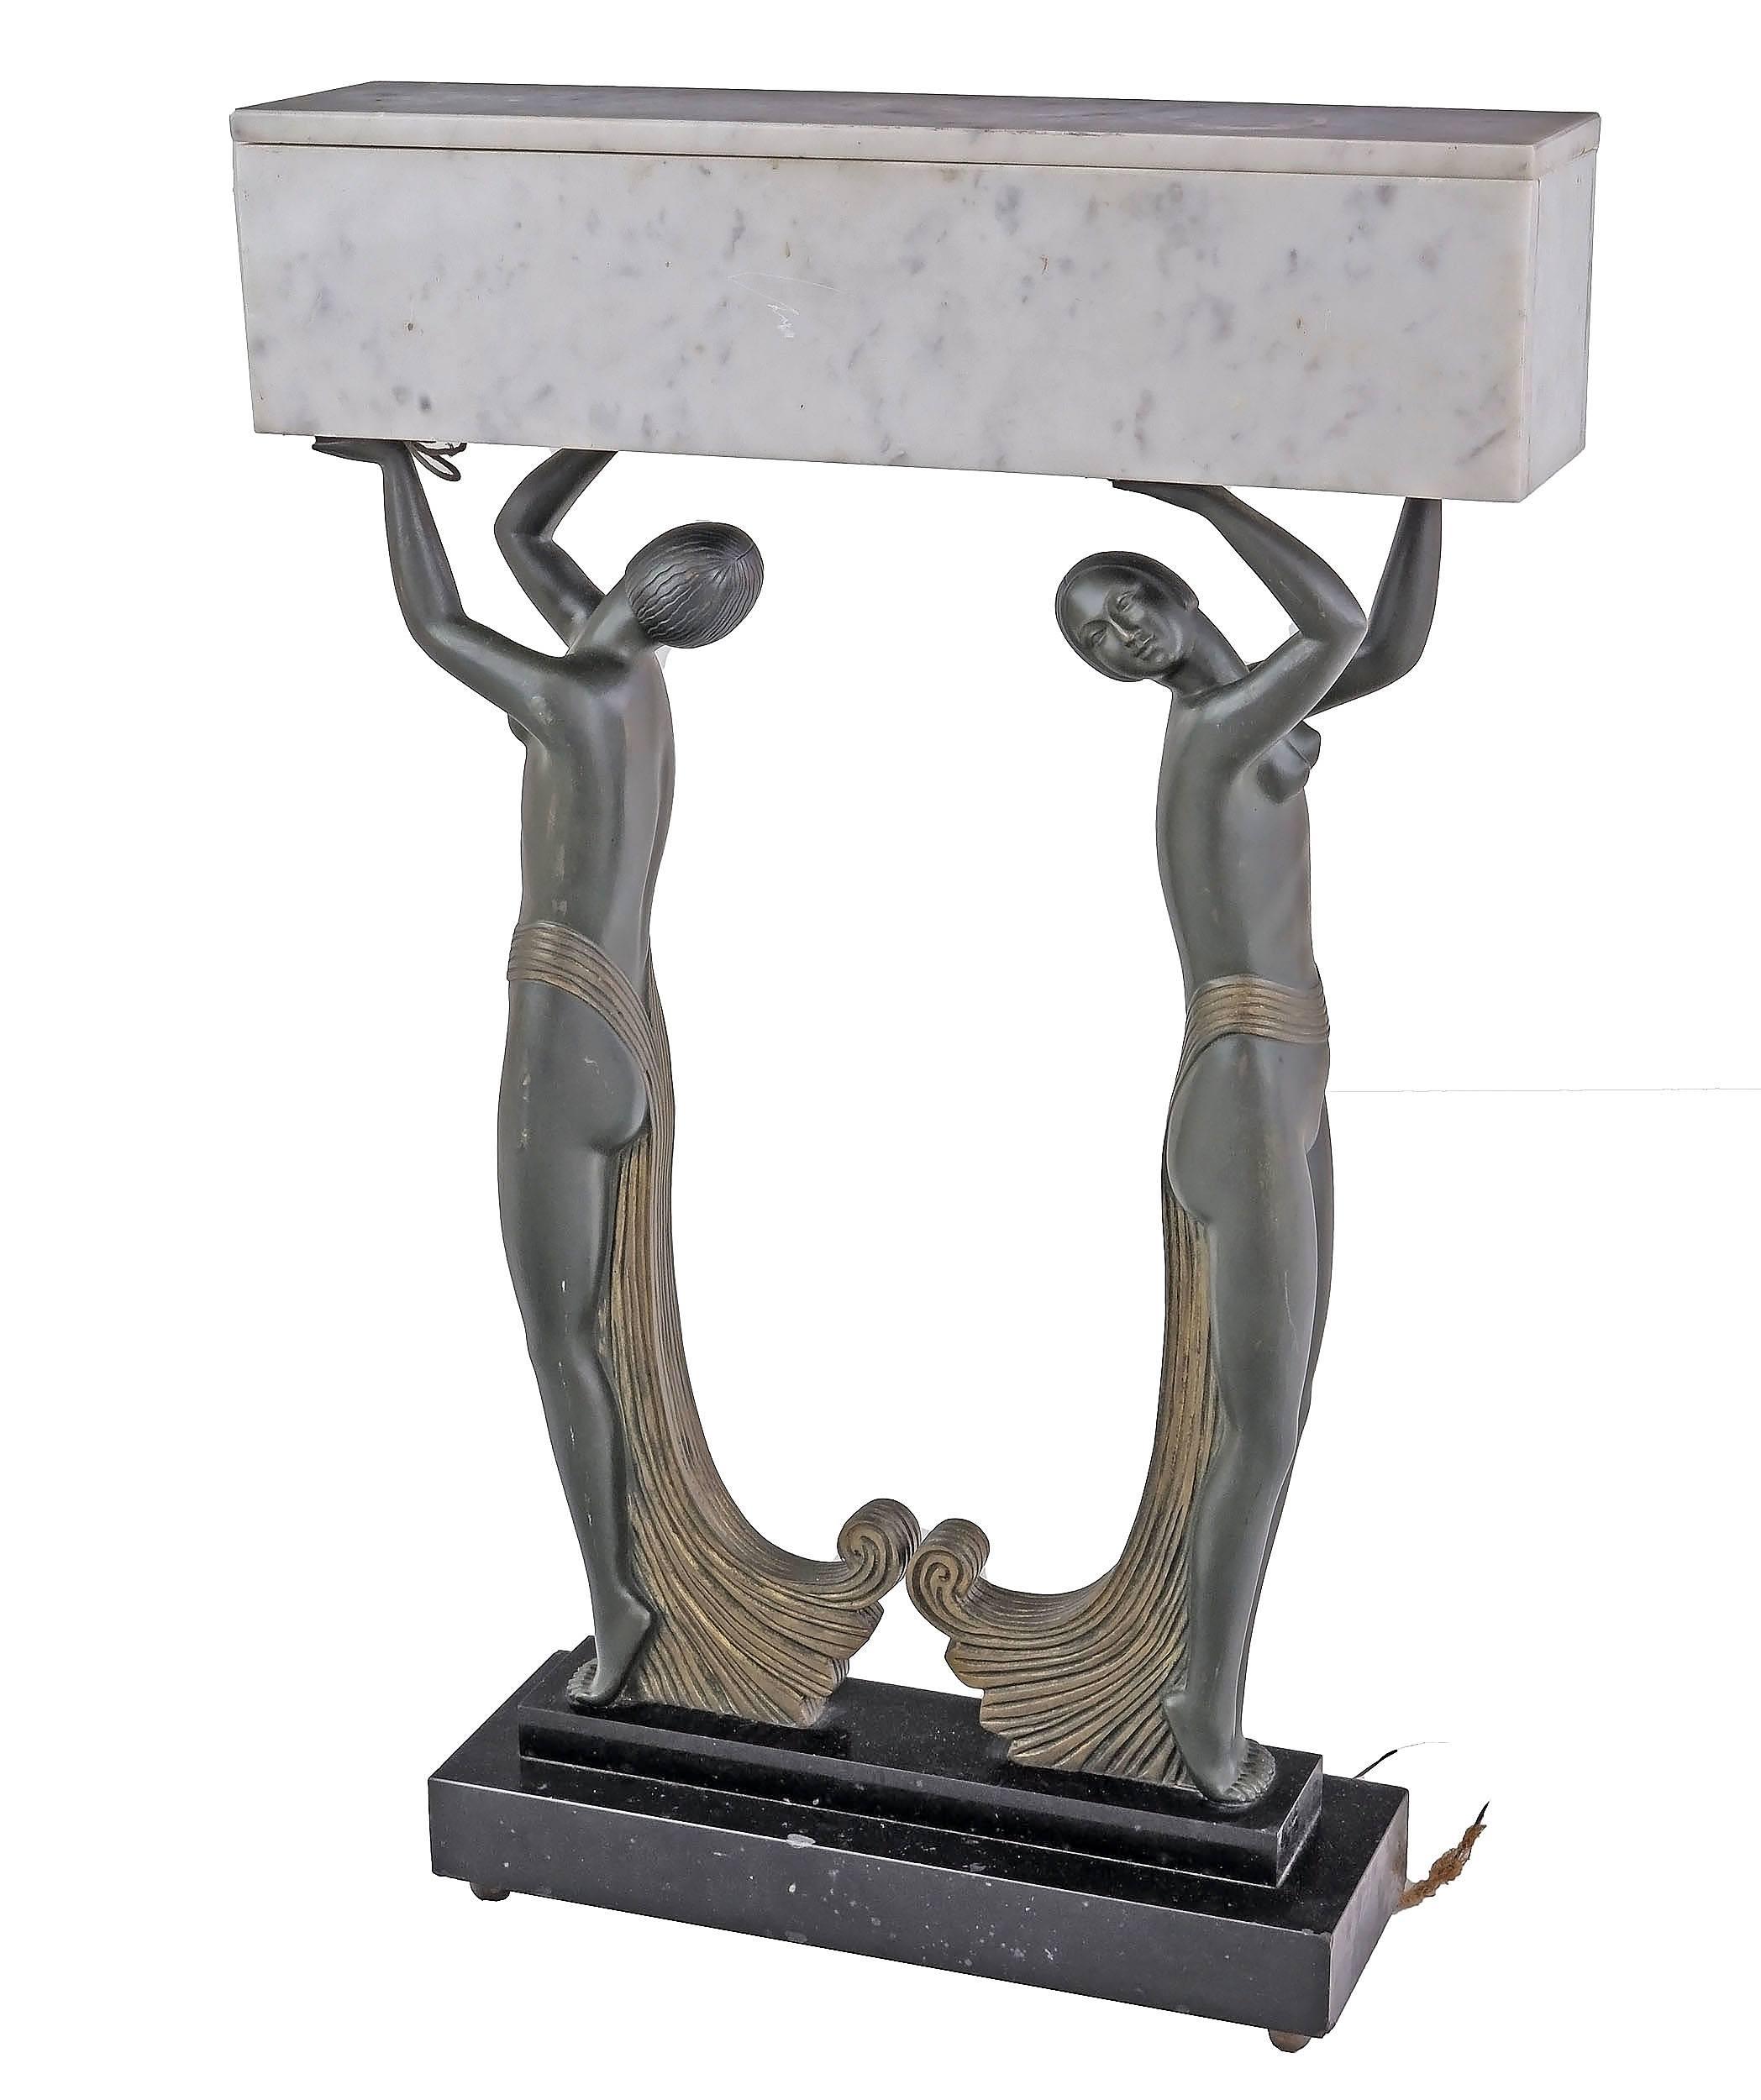 'Impressive Art Deco Bronze and Marble Lamp Circa 1920s'